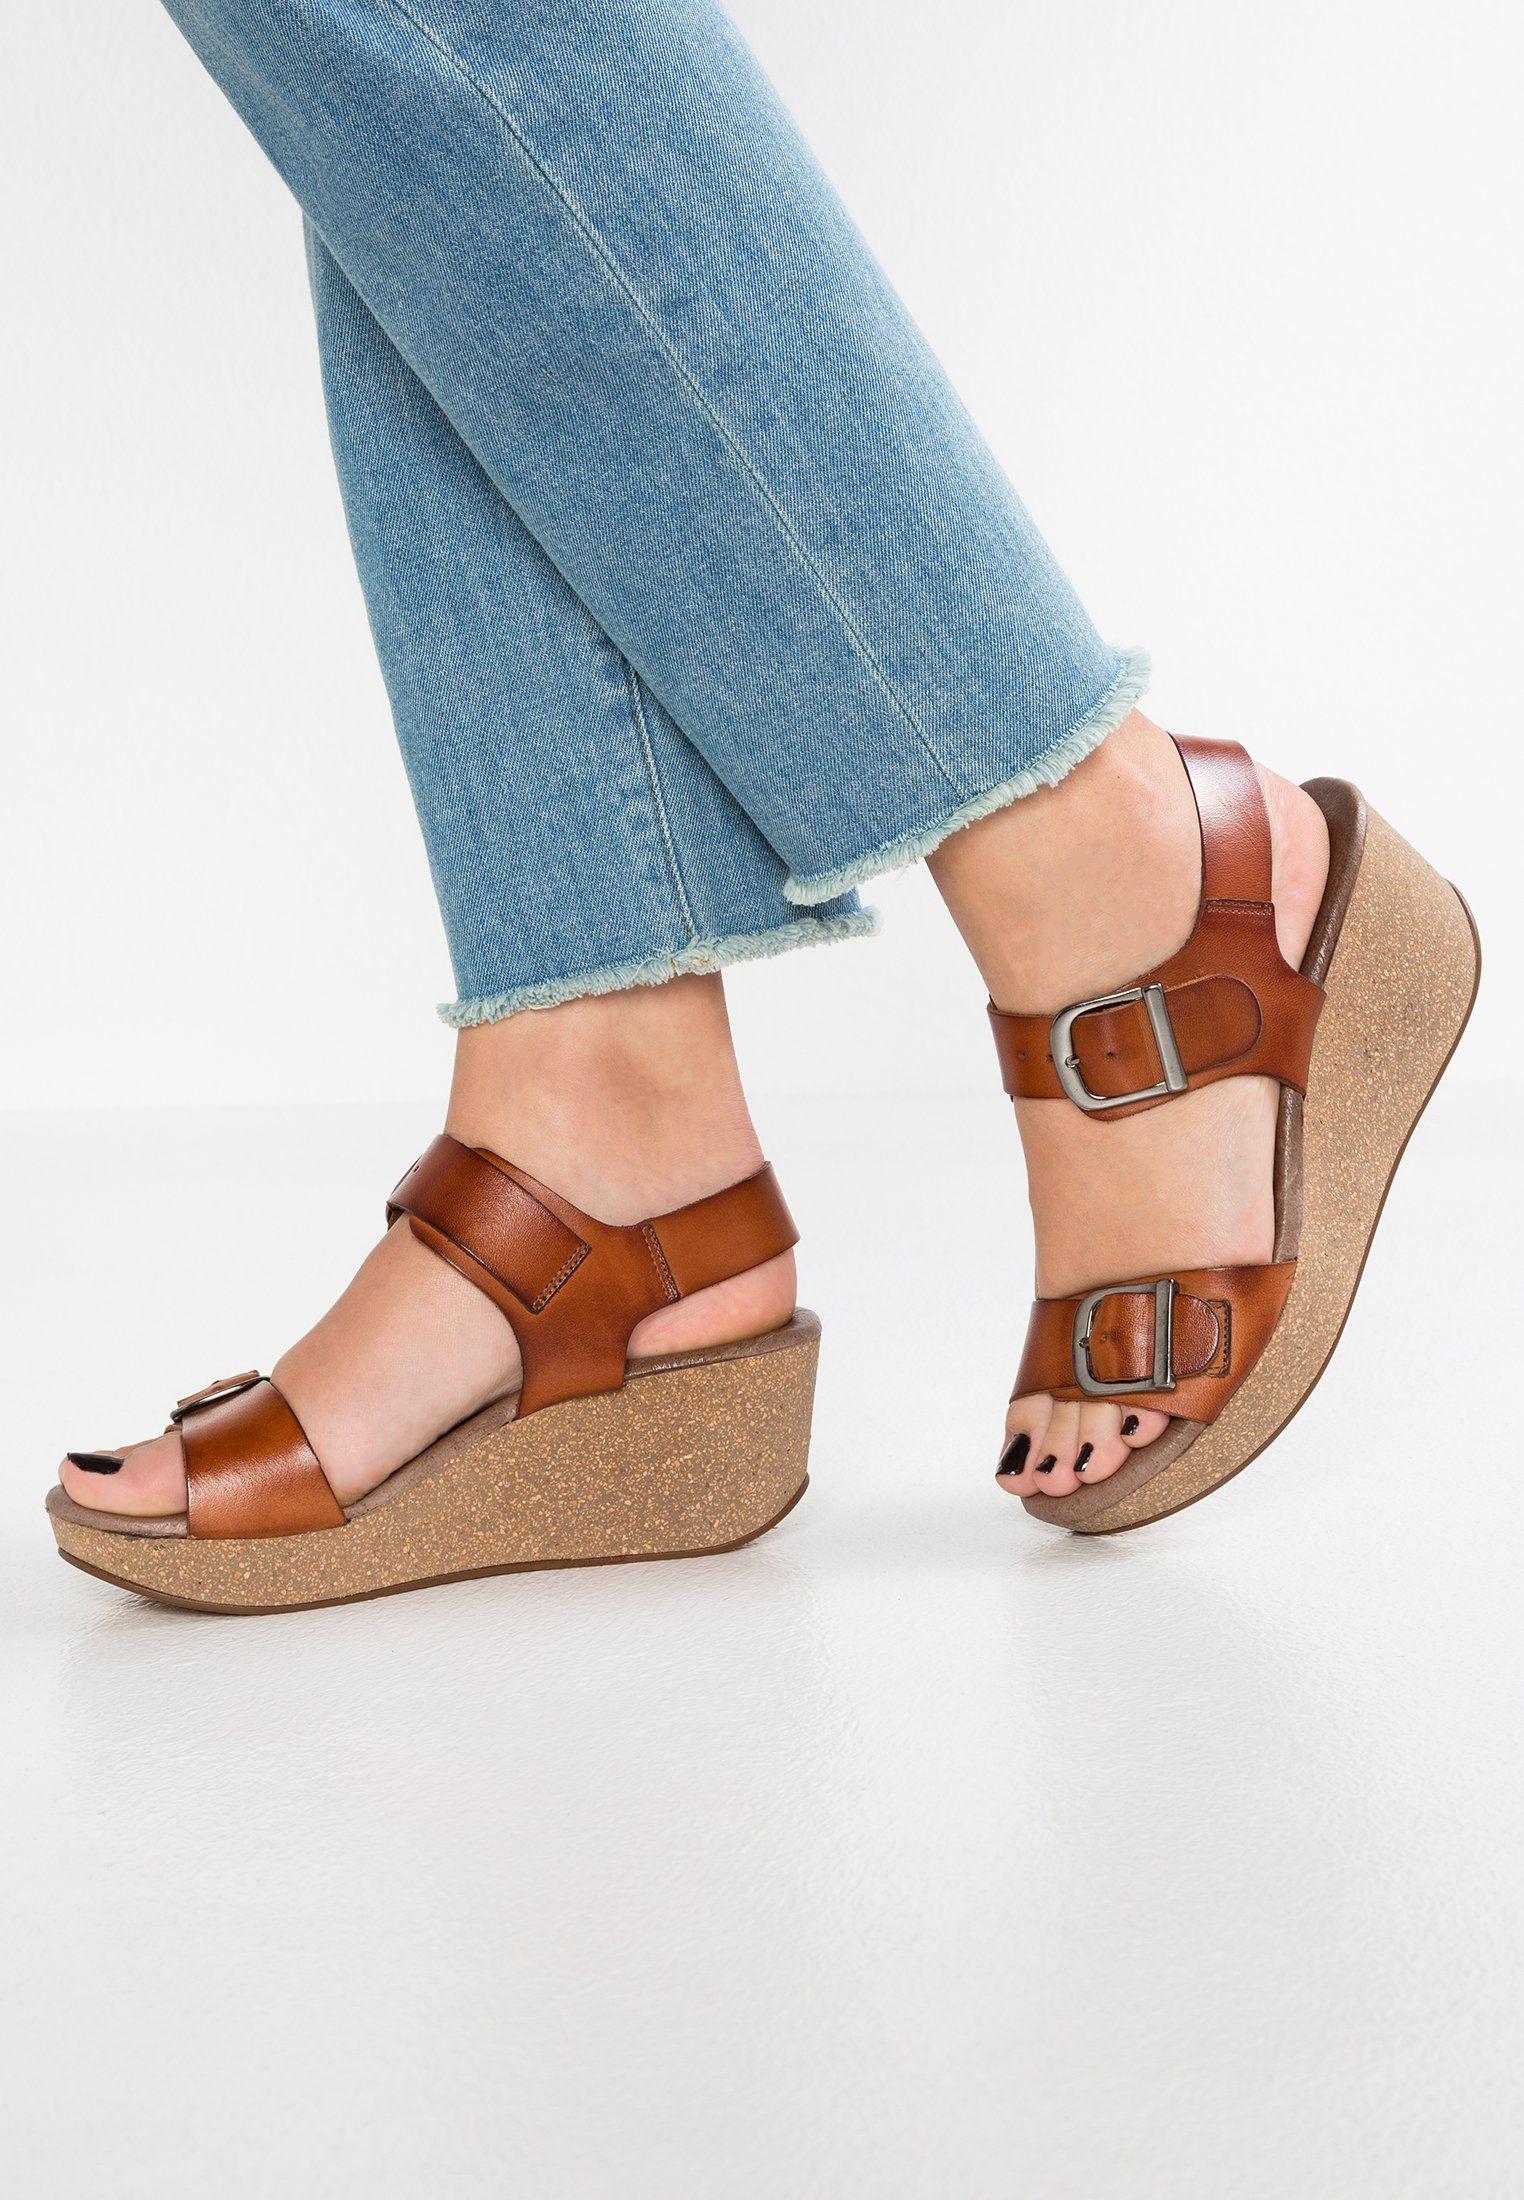 Pavement co tan Zalando Platform ukShoes CAMILLA sandals IY6yfmb7gv